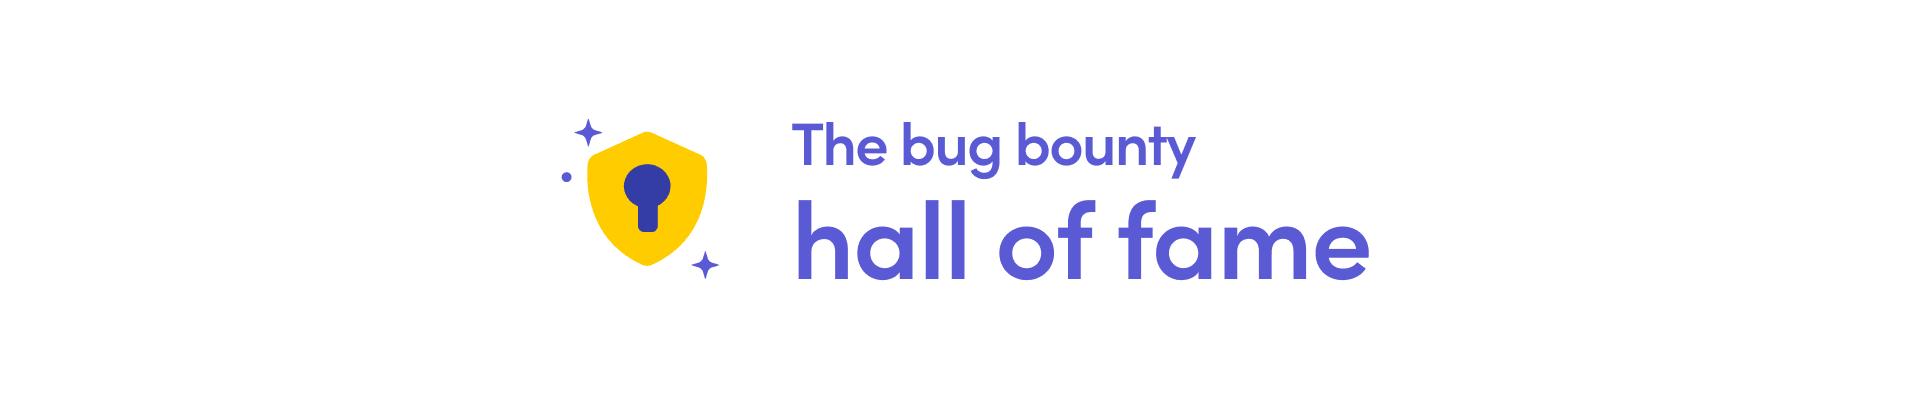 Bug bounty LP header